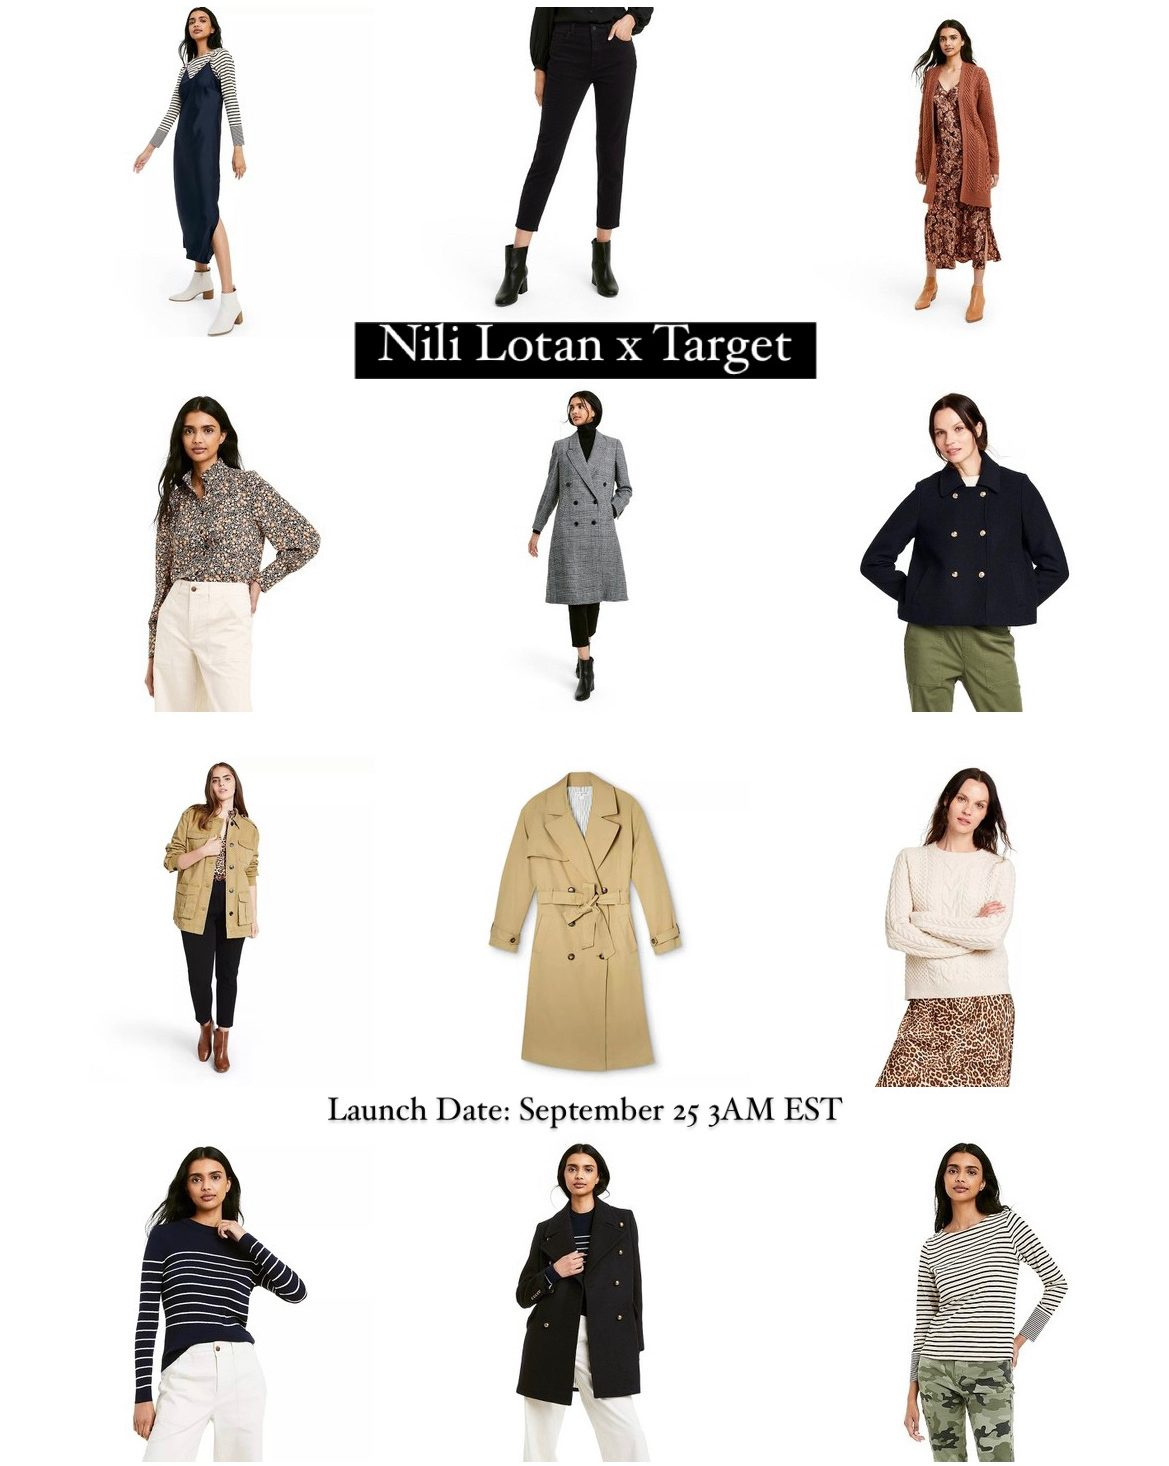 Nili Lotan X Target fall collection